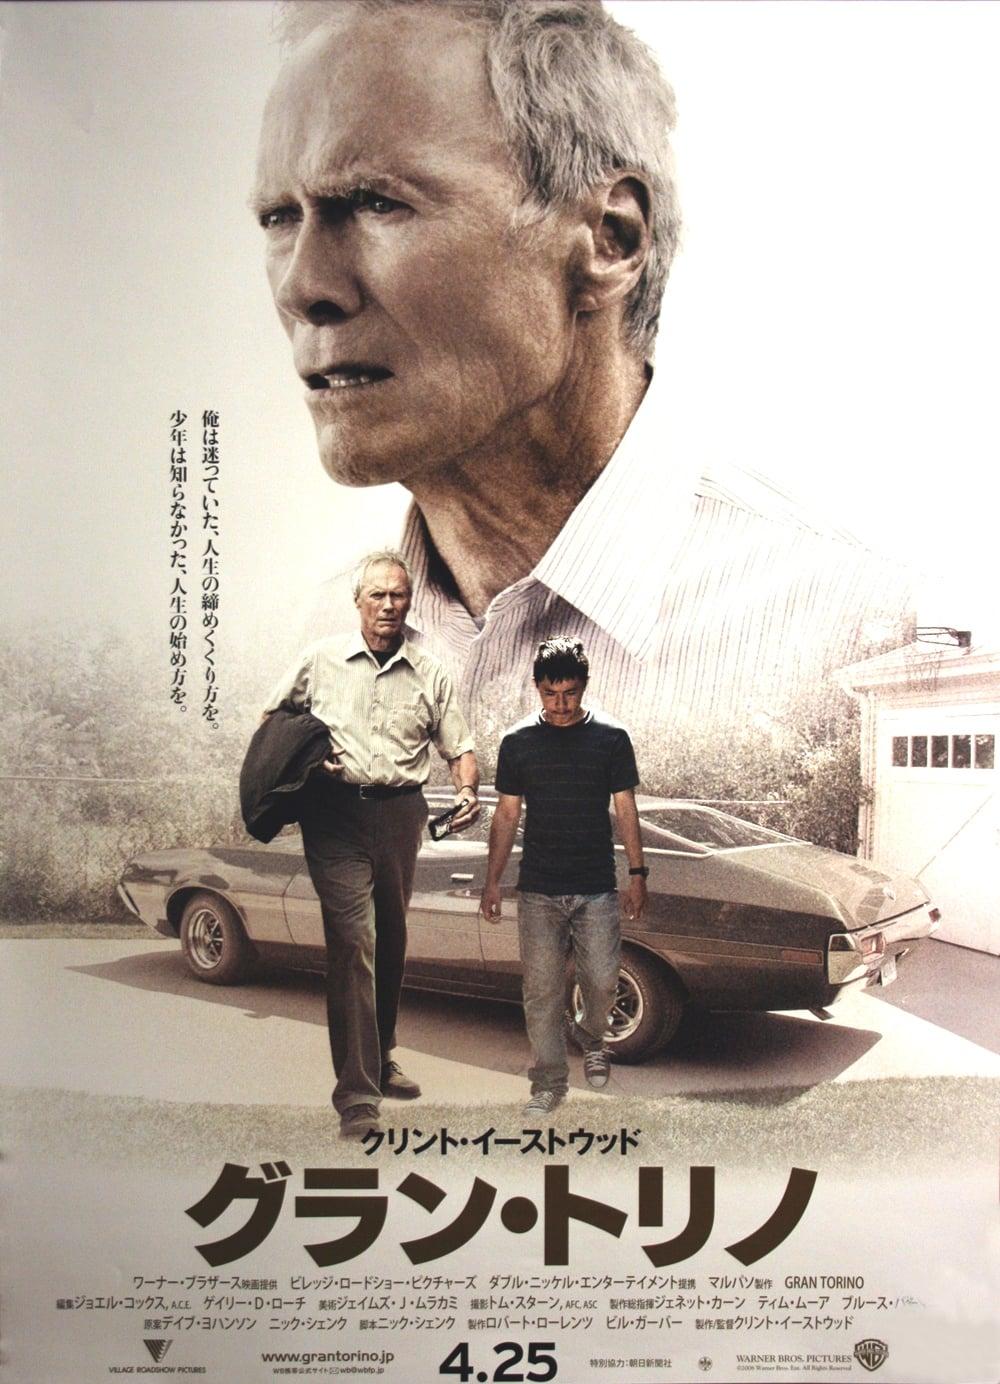 Gran Torino 2008 Vodly Movies